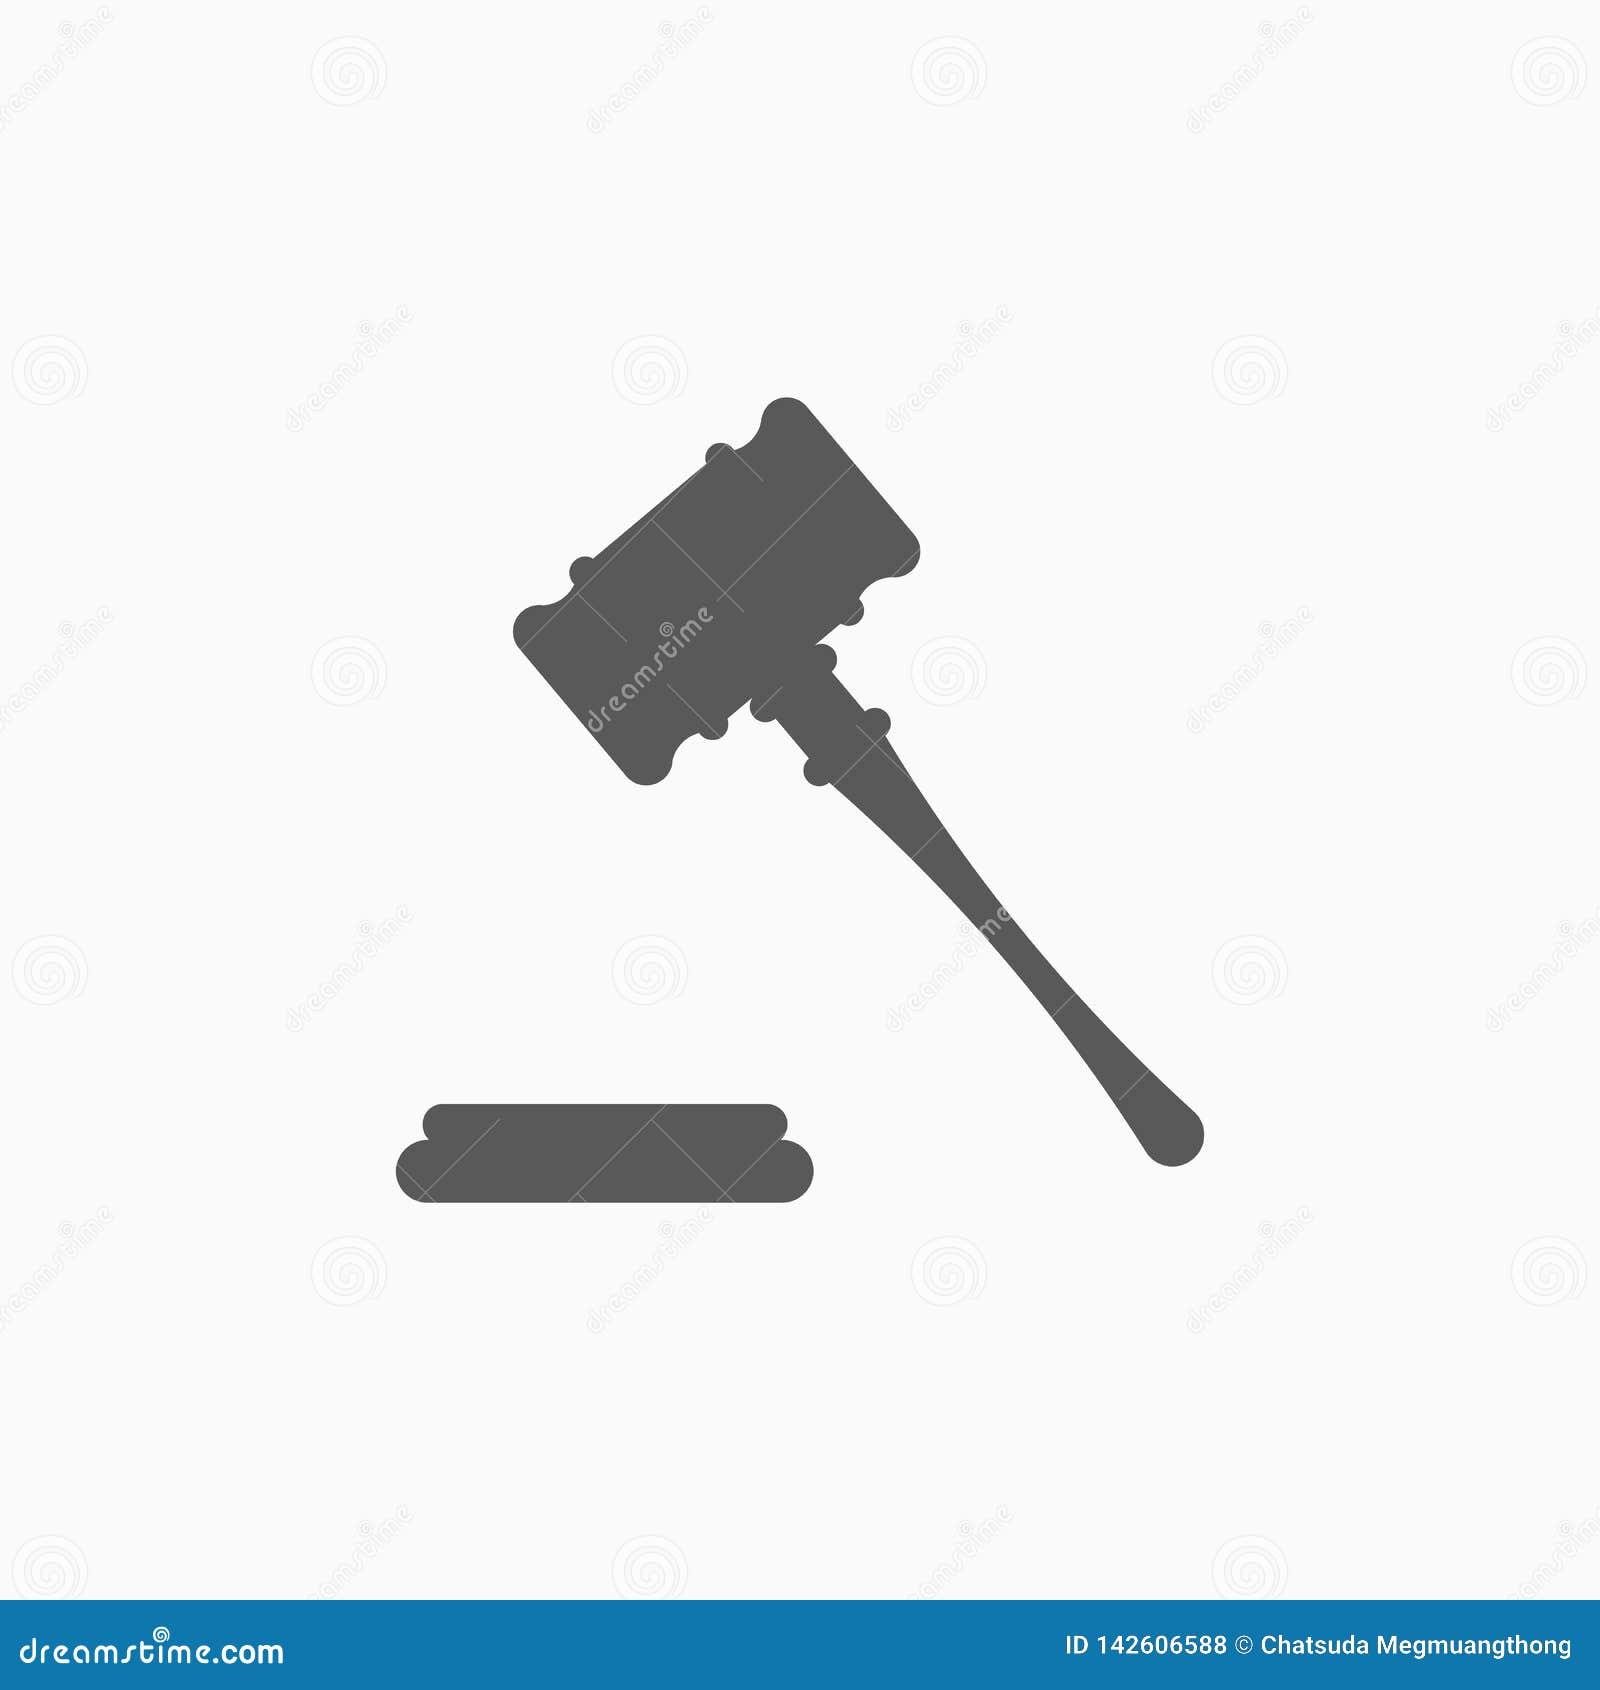 Gavel εικονίδιο, σφυρί, δικαστής, κρίση, σφυρί δημοπρασίας